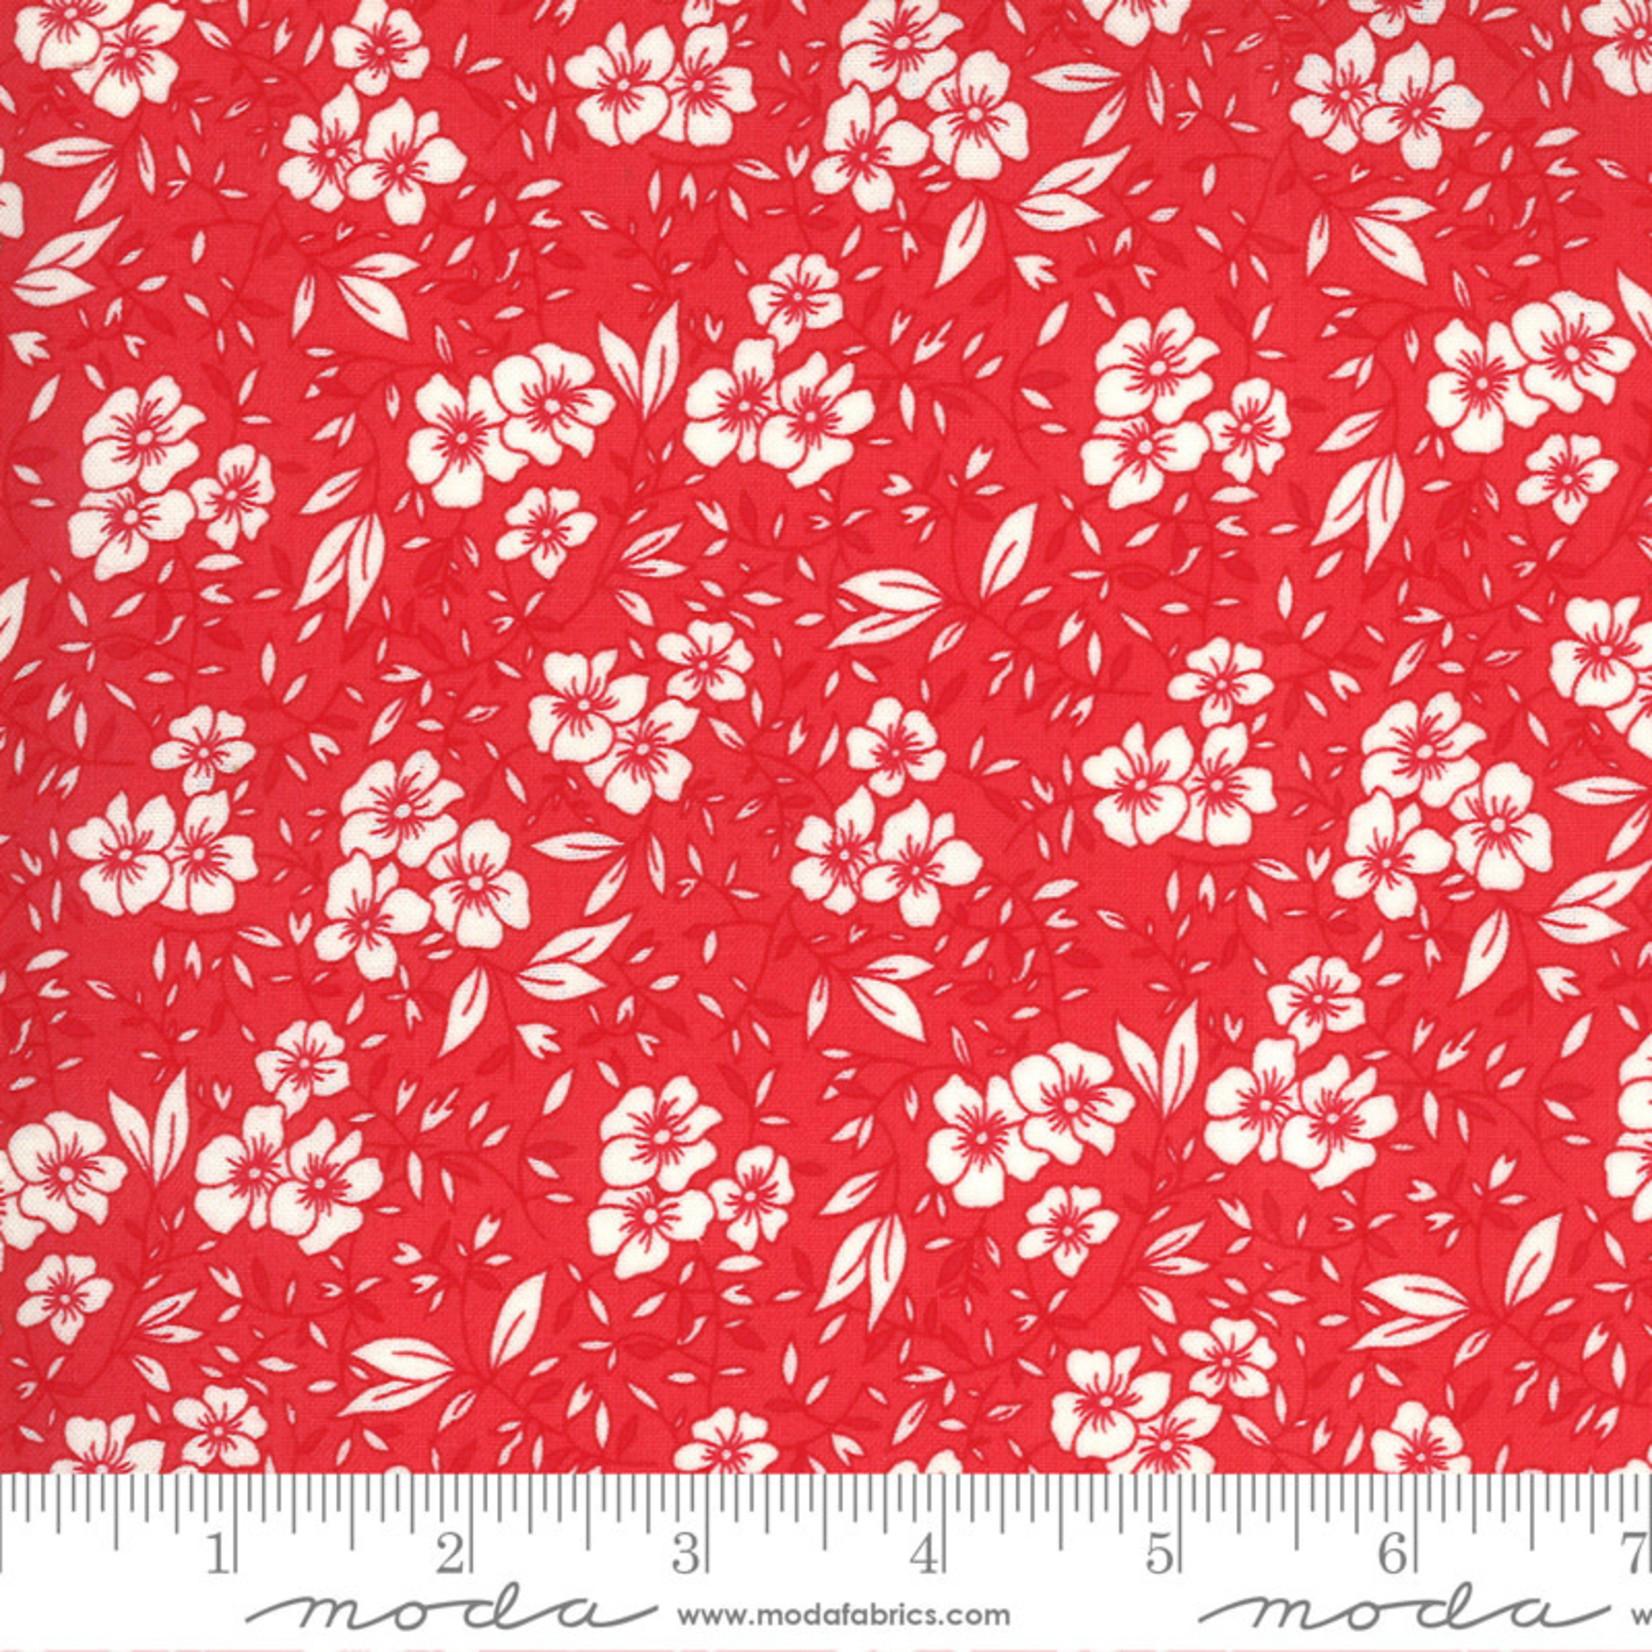 Chloe's Closet 30s Playtime, Friendly Blooms Flora, Scarlet 33592-28 $0.20 per cm or $20/m